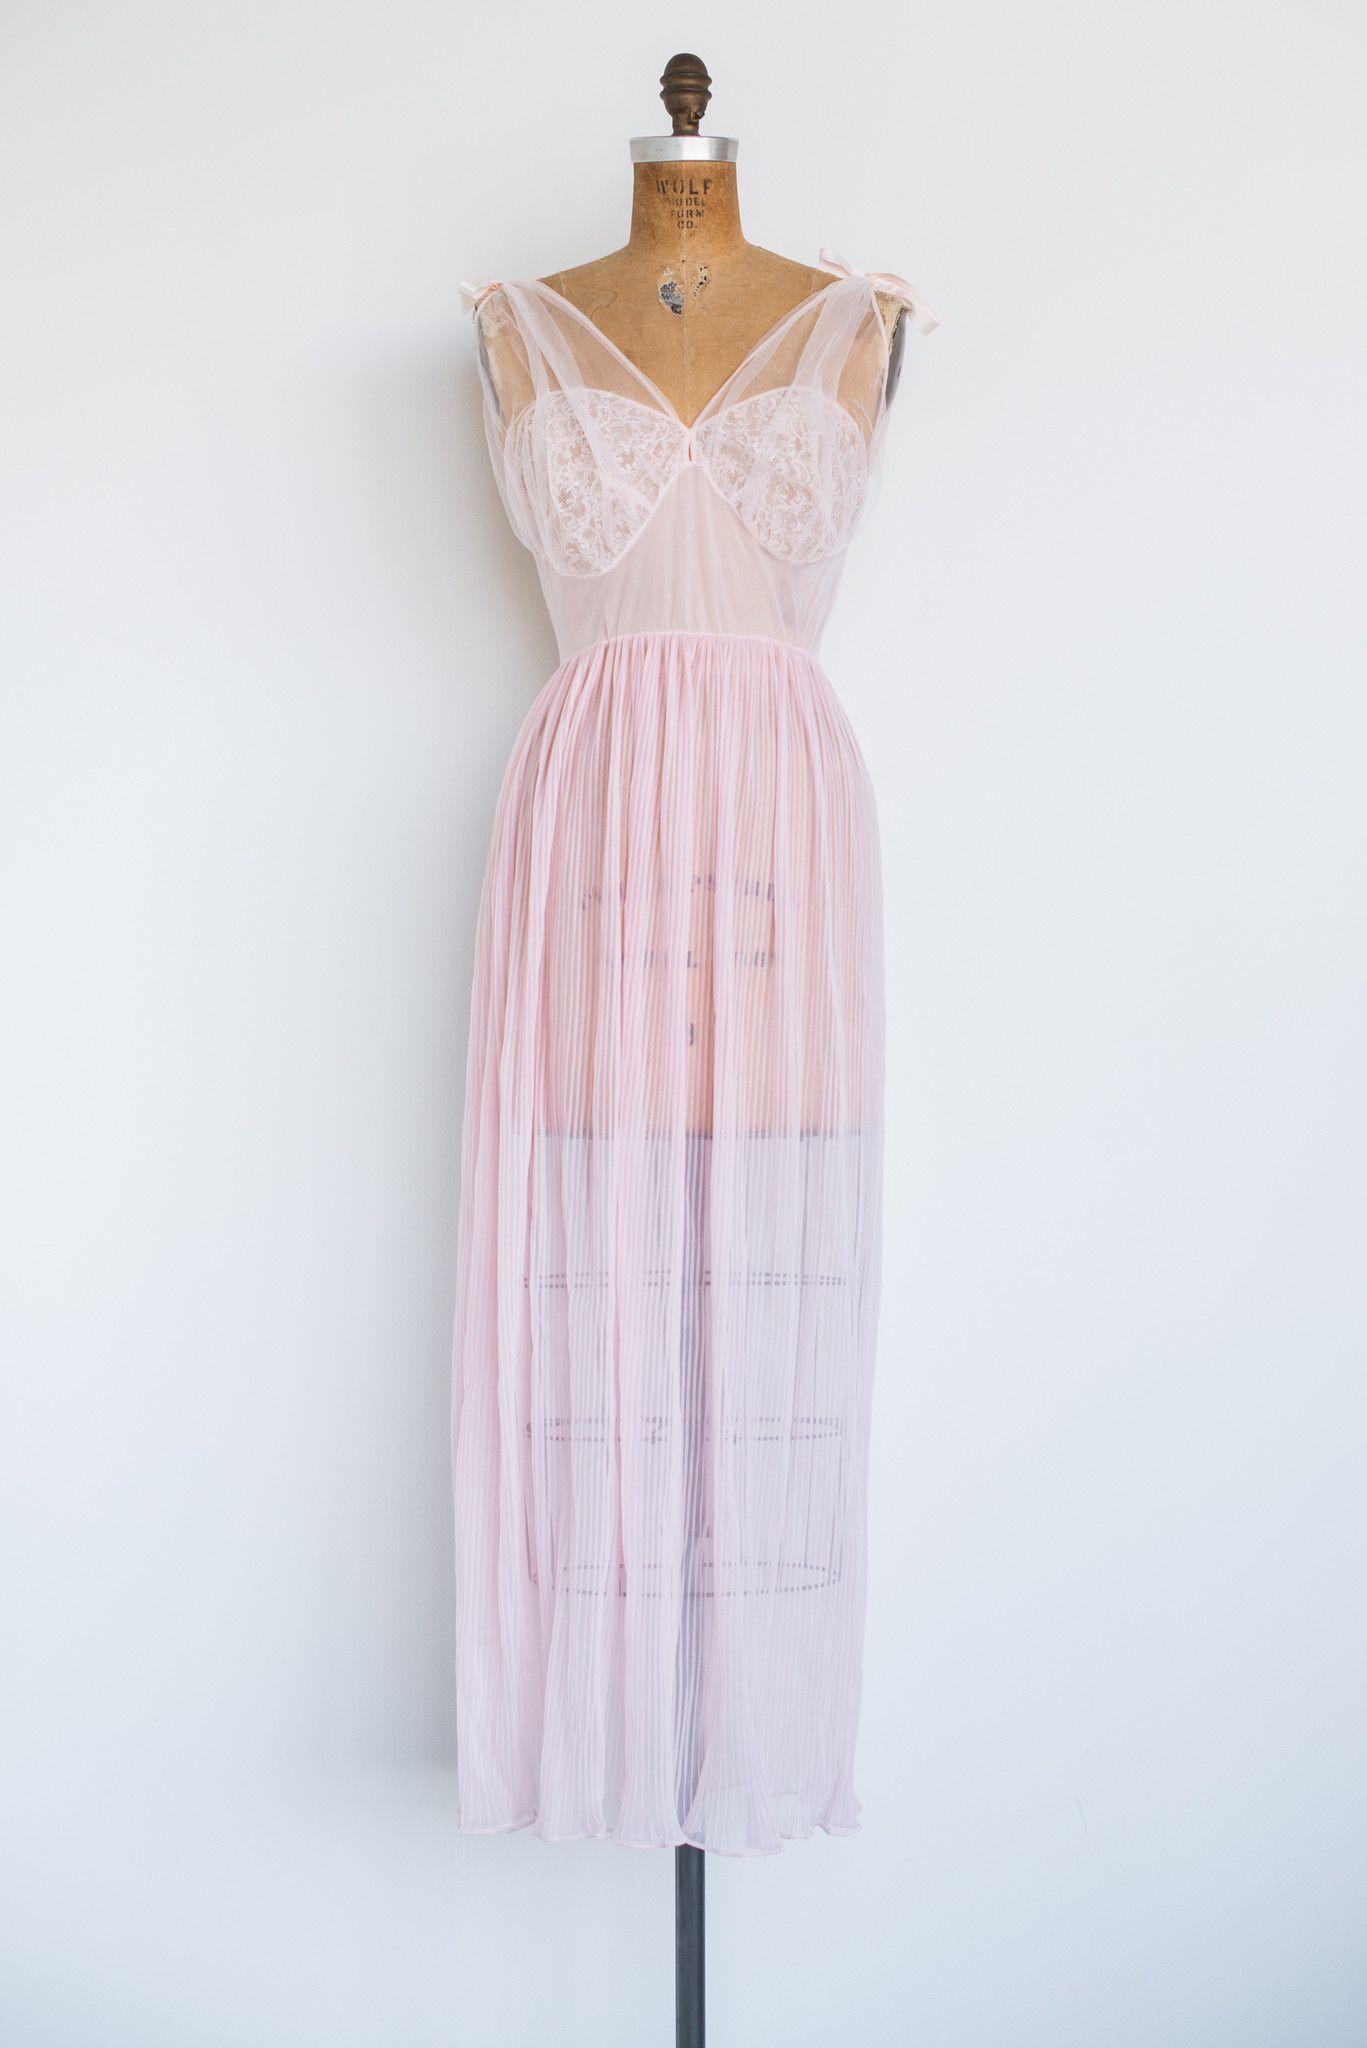 1950s Pink Nylon Slip with Jacket - S/M